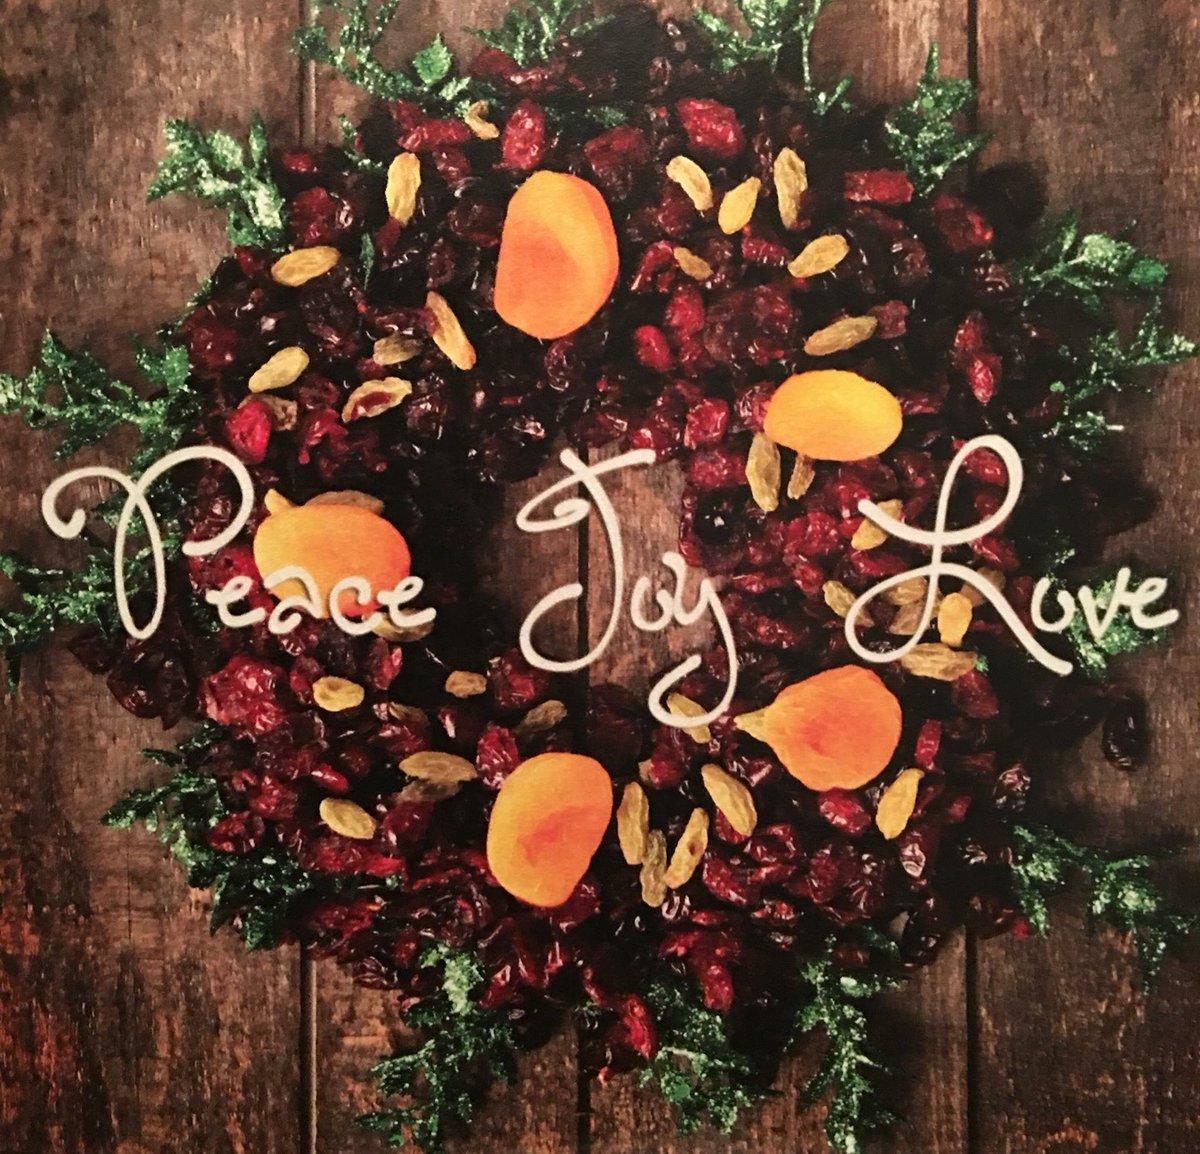 Wishing you Peace Joy And Love this holiday season! . #Nutrilawn #lawncare #toronto #markham #woodbridge #ajax #york #durham #peace #joy #love